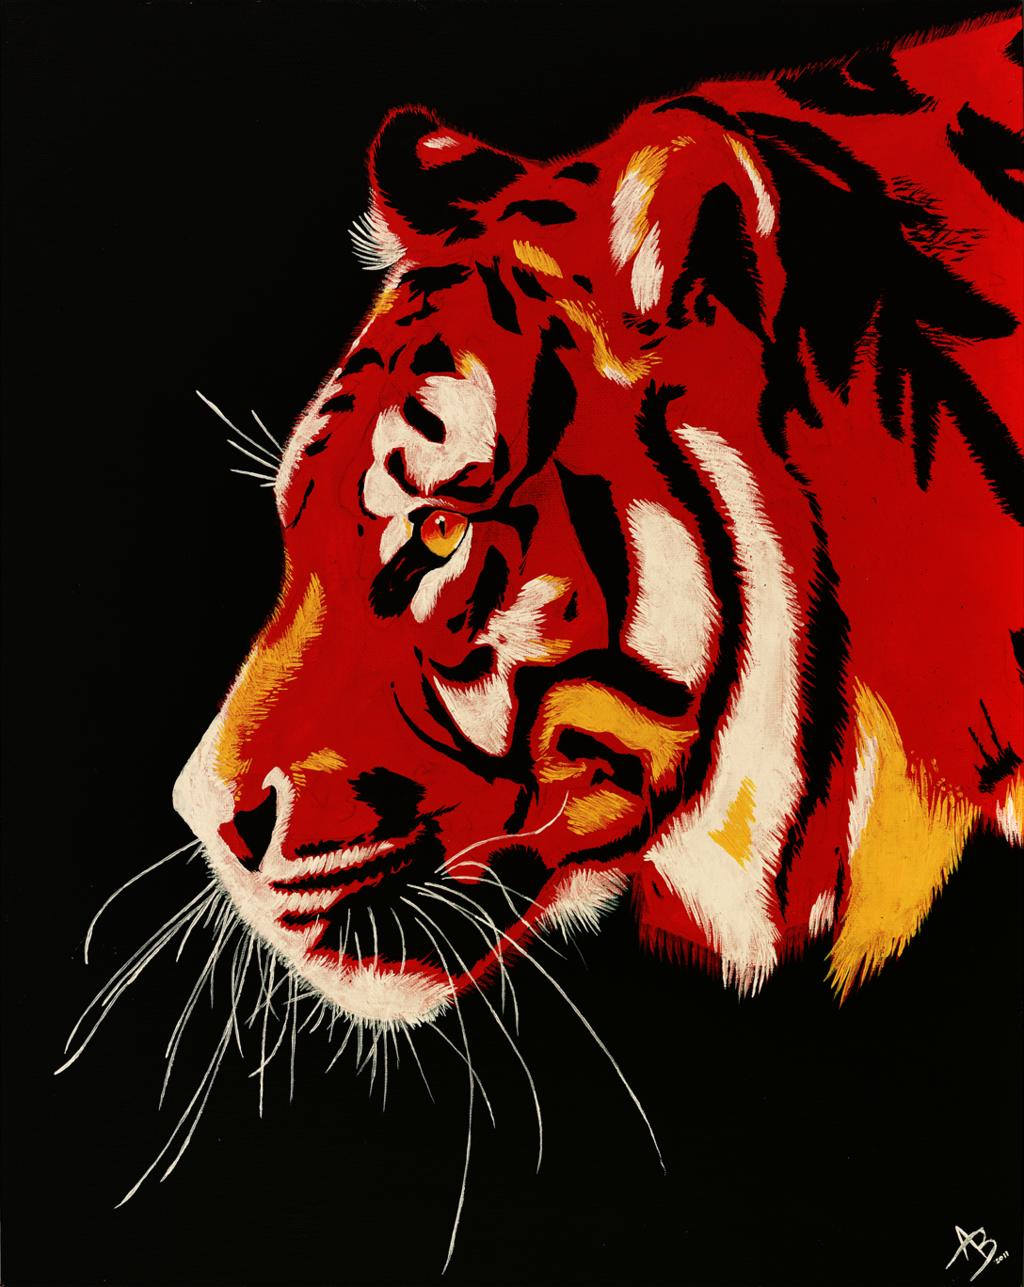 Tigerrrr